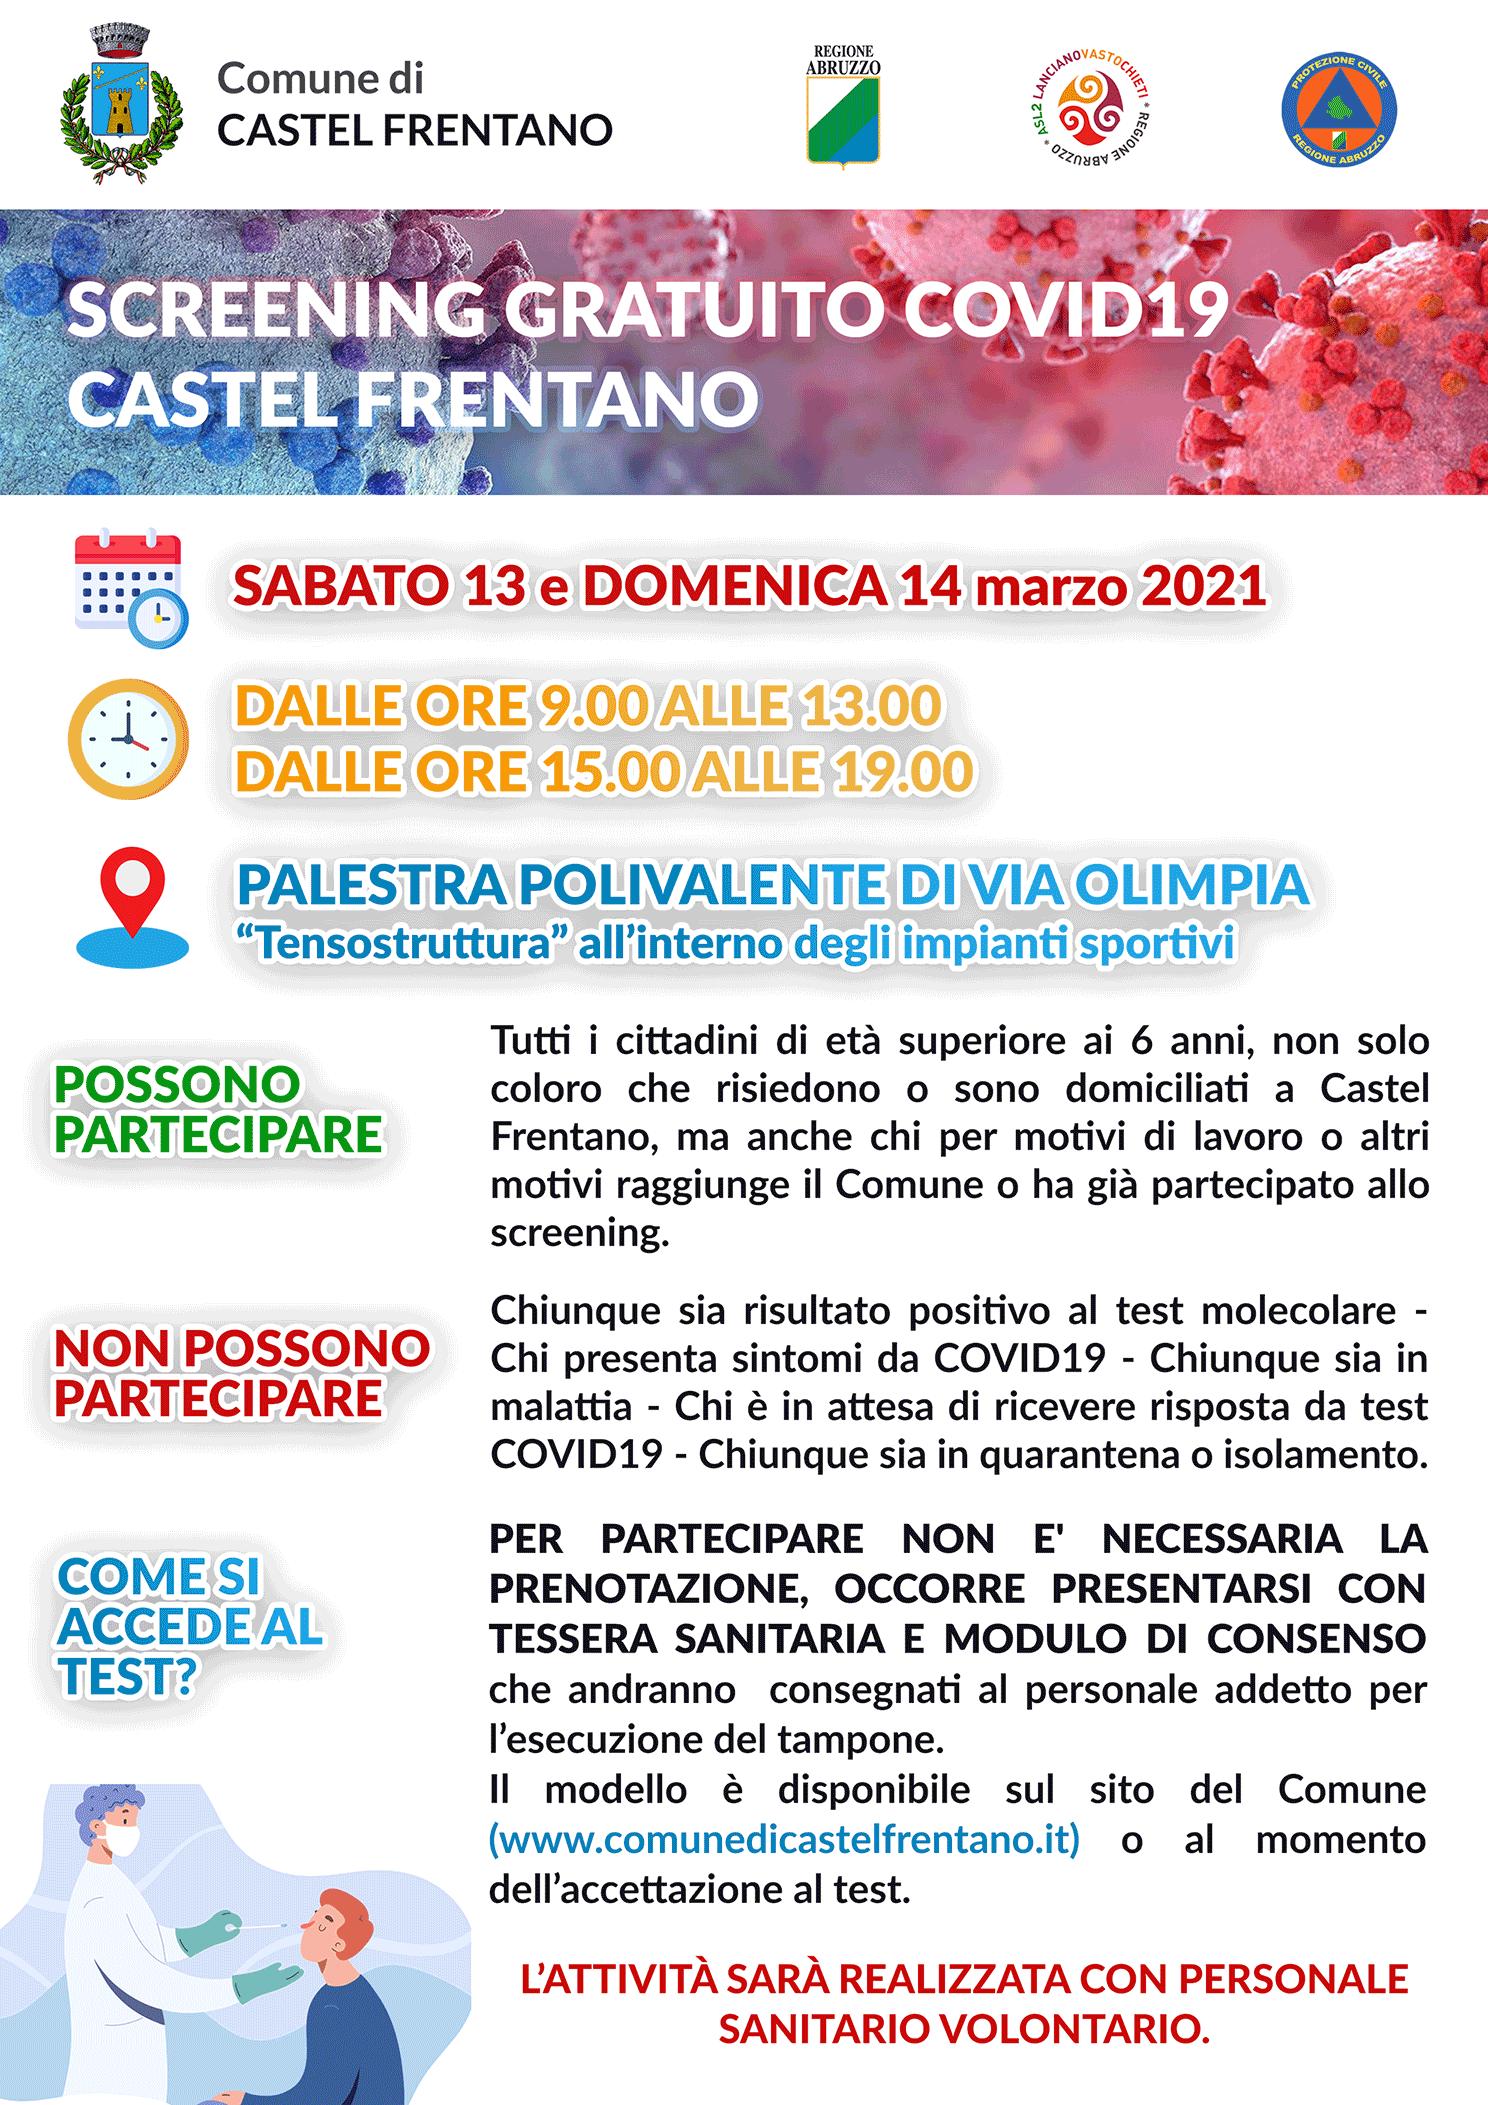 Locandina Screening Castel Frentano